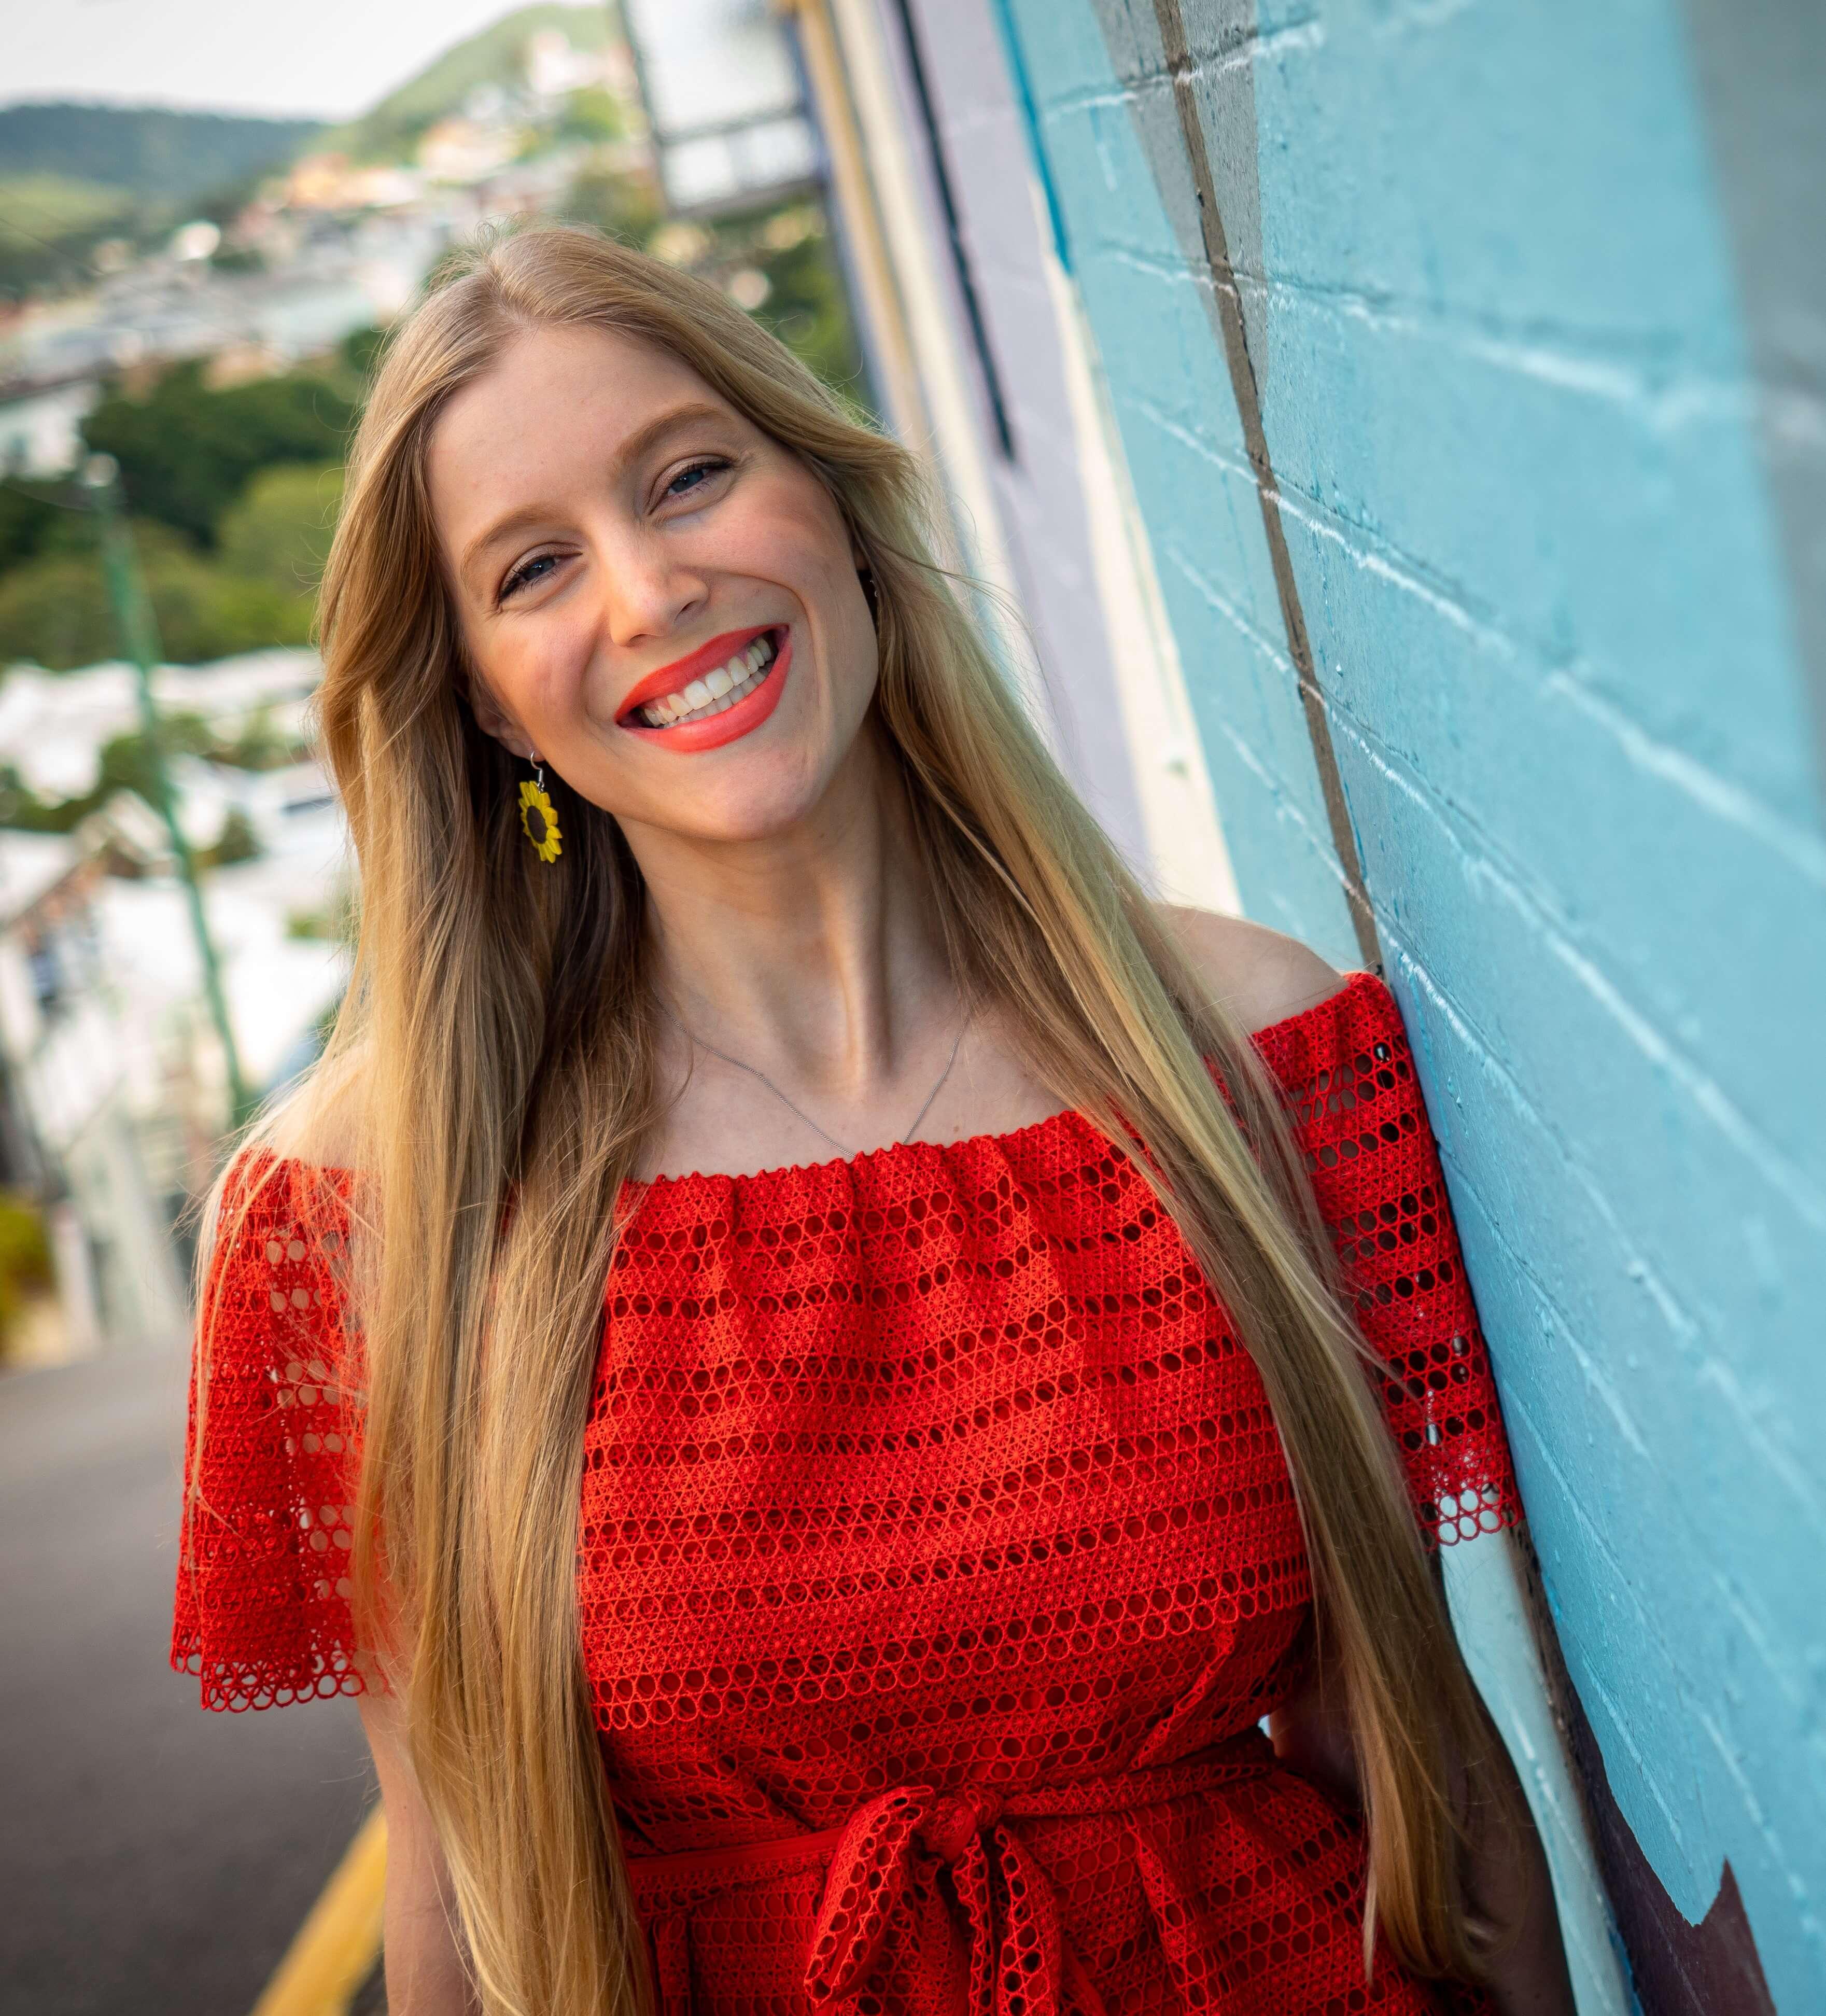 Brisbane copywriter Erin Haywood